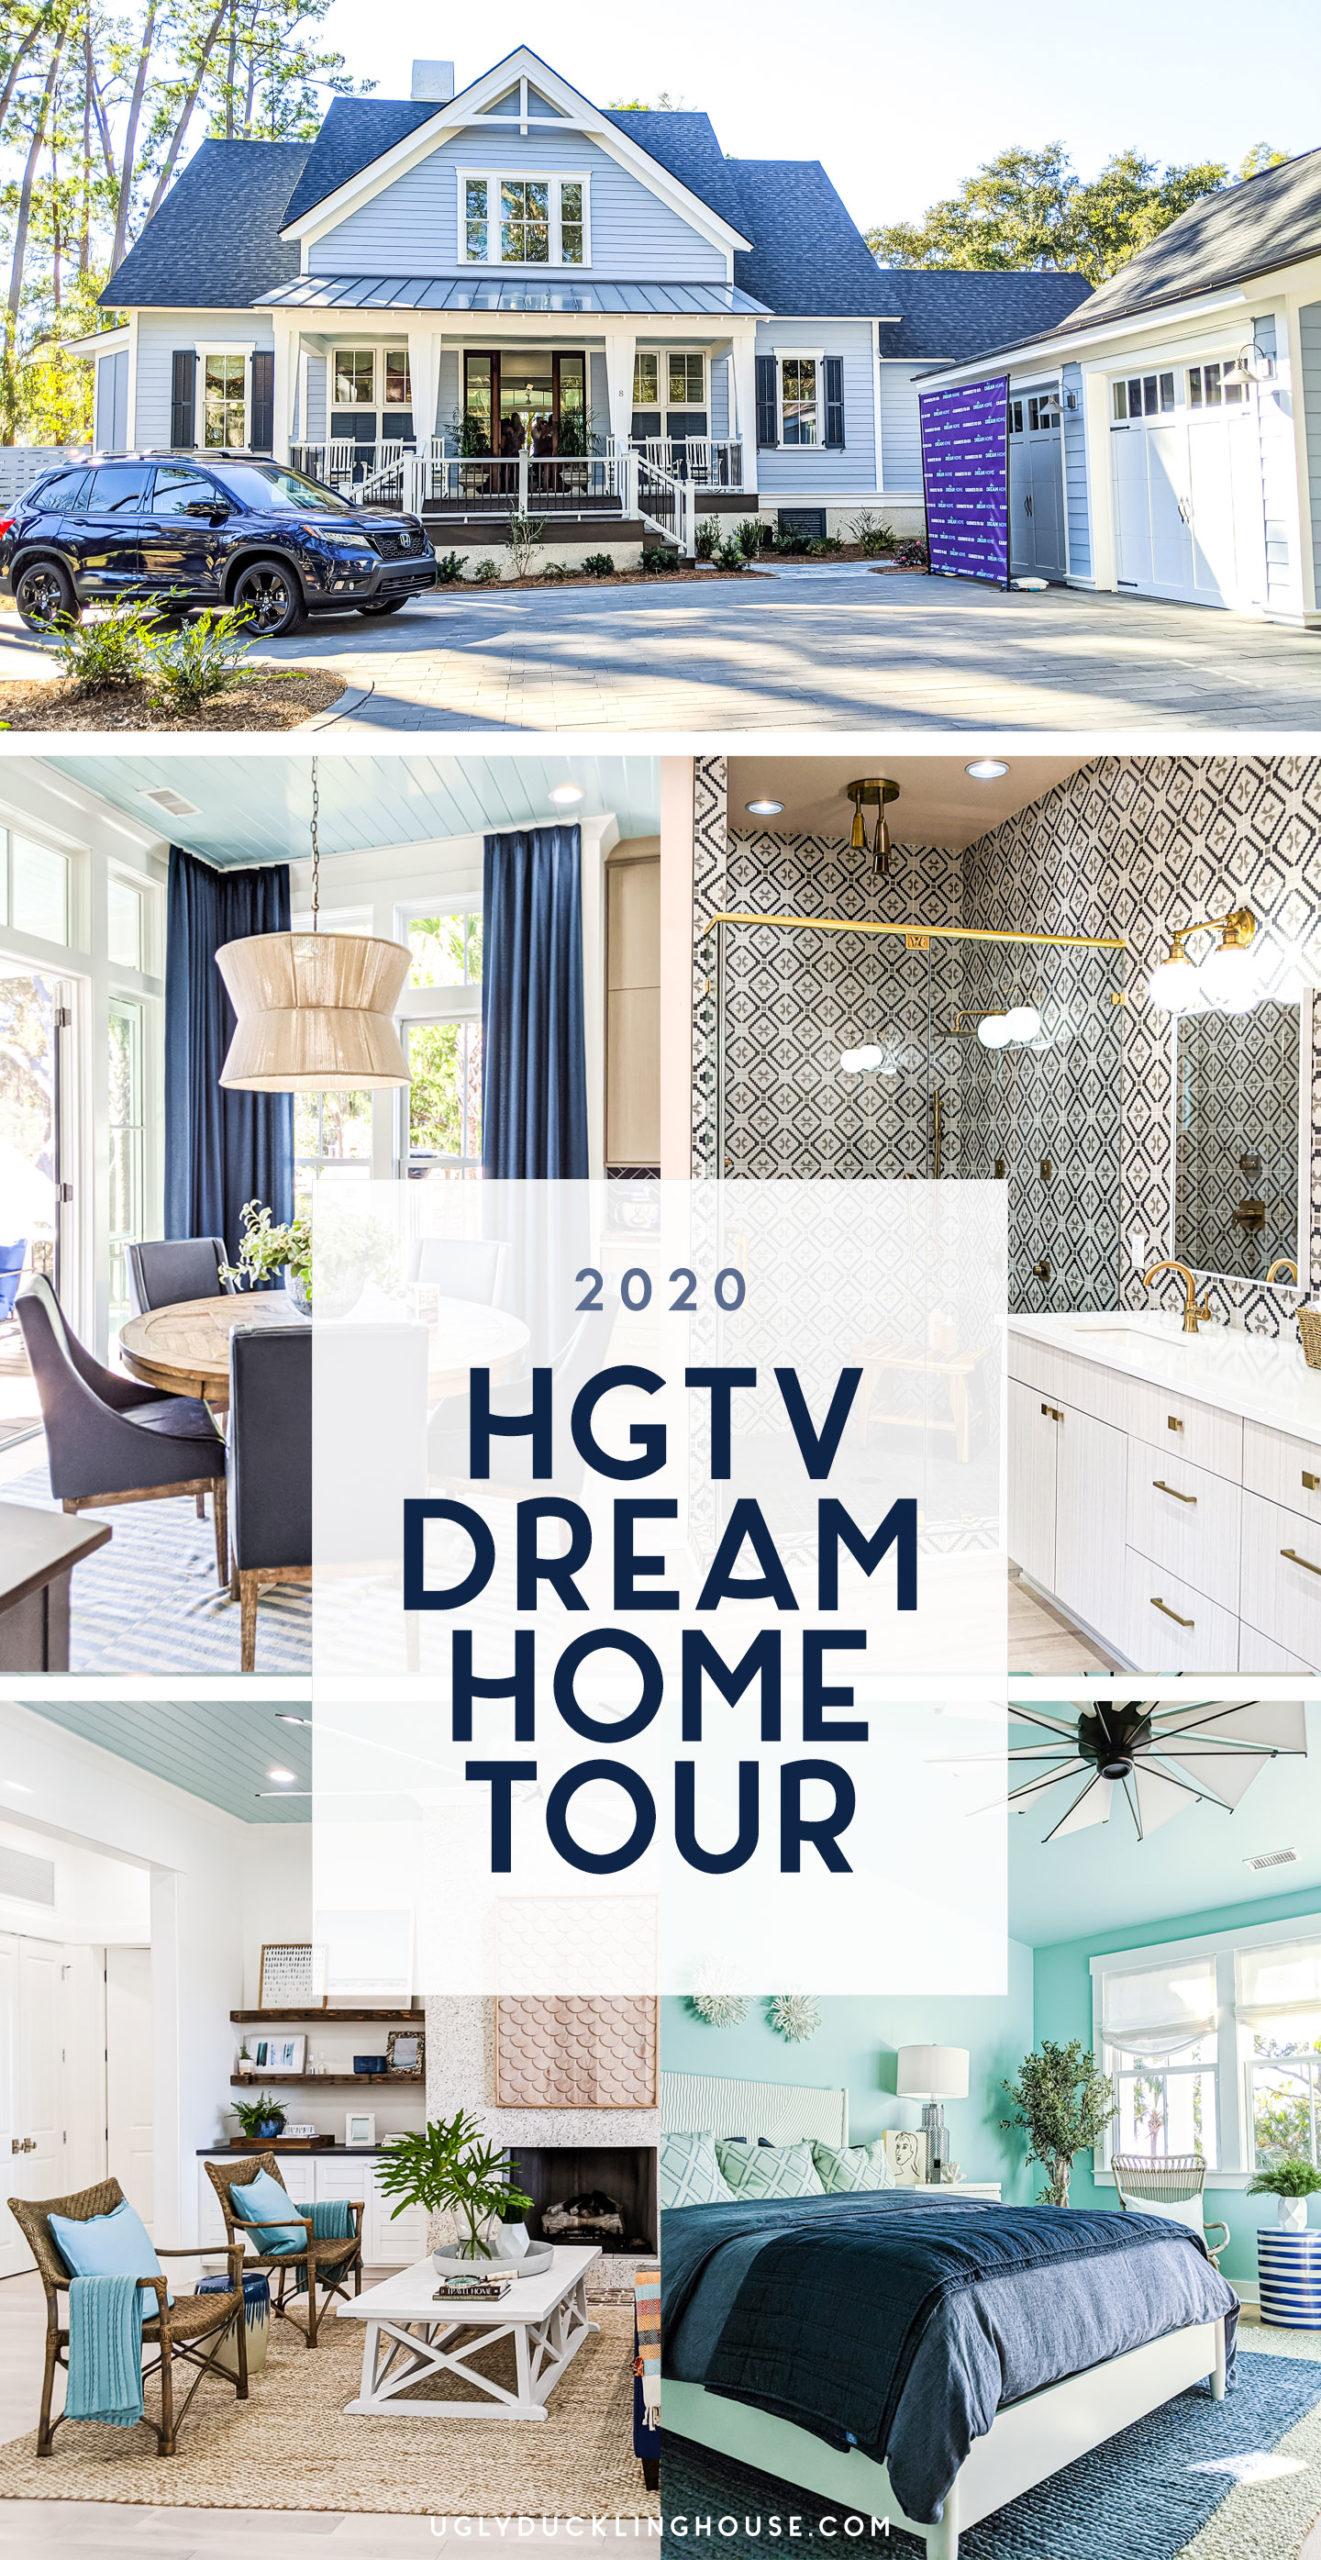 2020 HGTV dream home house tour and video tour